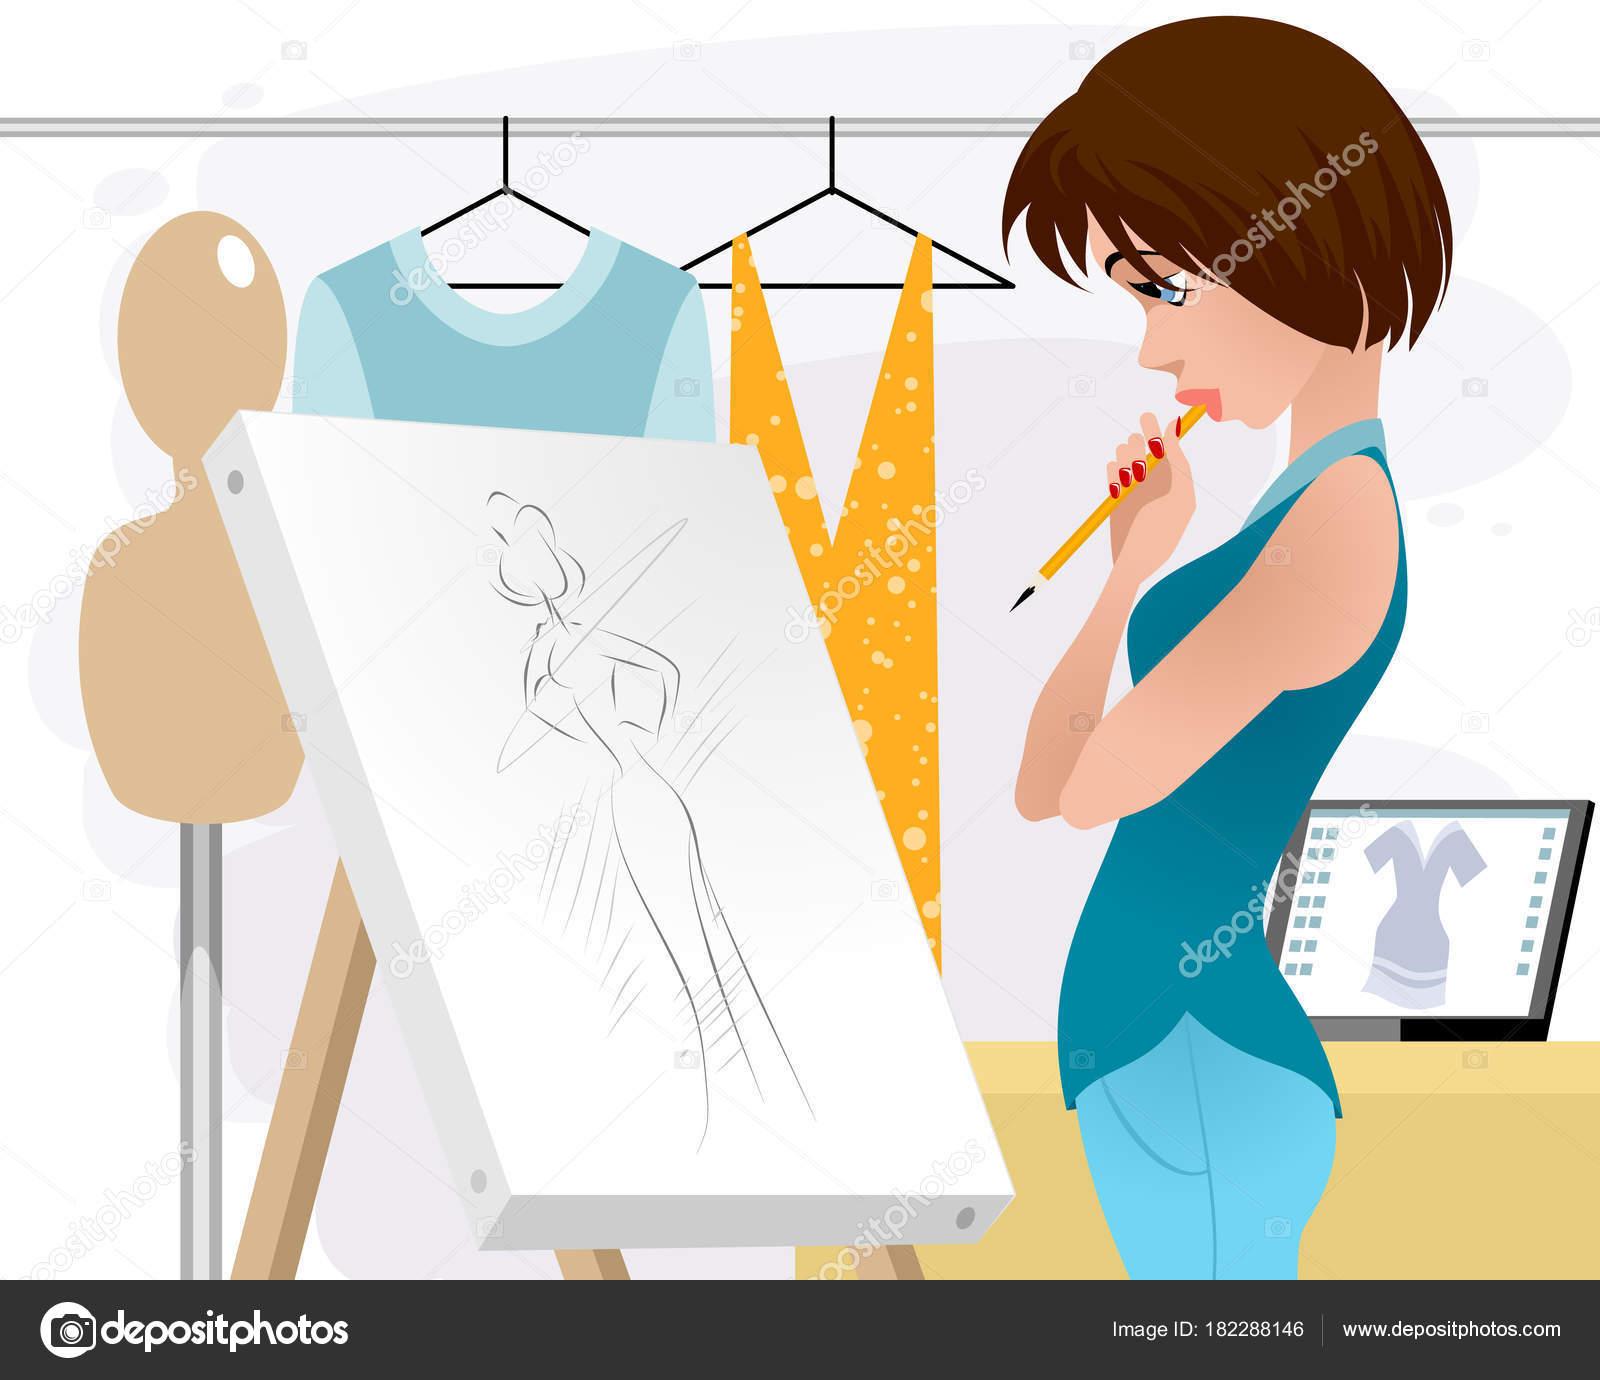 4e013f786d Εικονογράφηση διάνυσμα ρούχα γνωστών σχεδιαστών στο χώρο εργασίας —  Διάνυσμα με ...